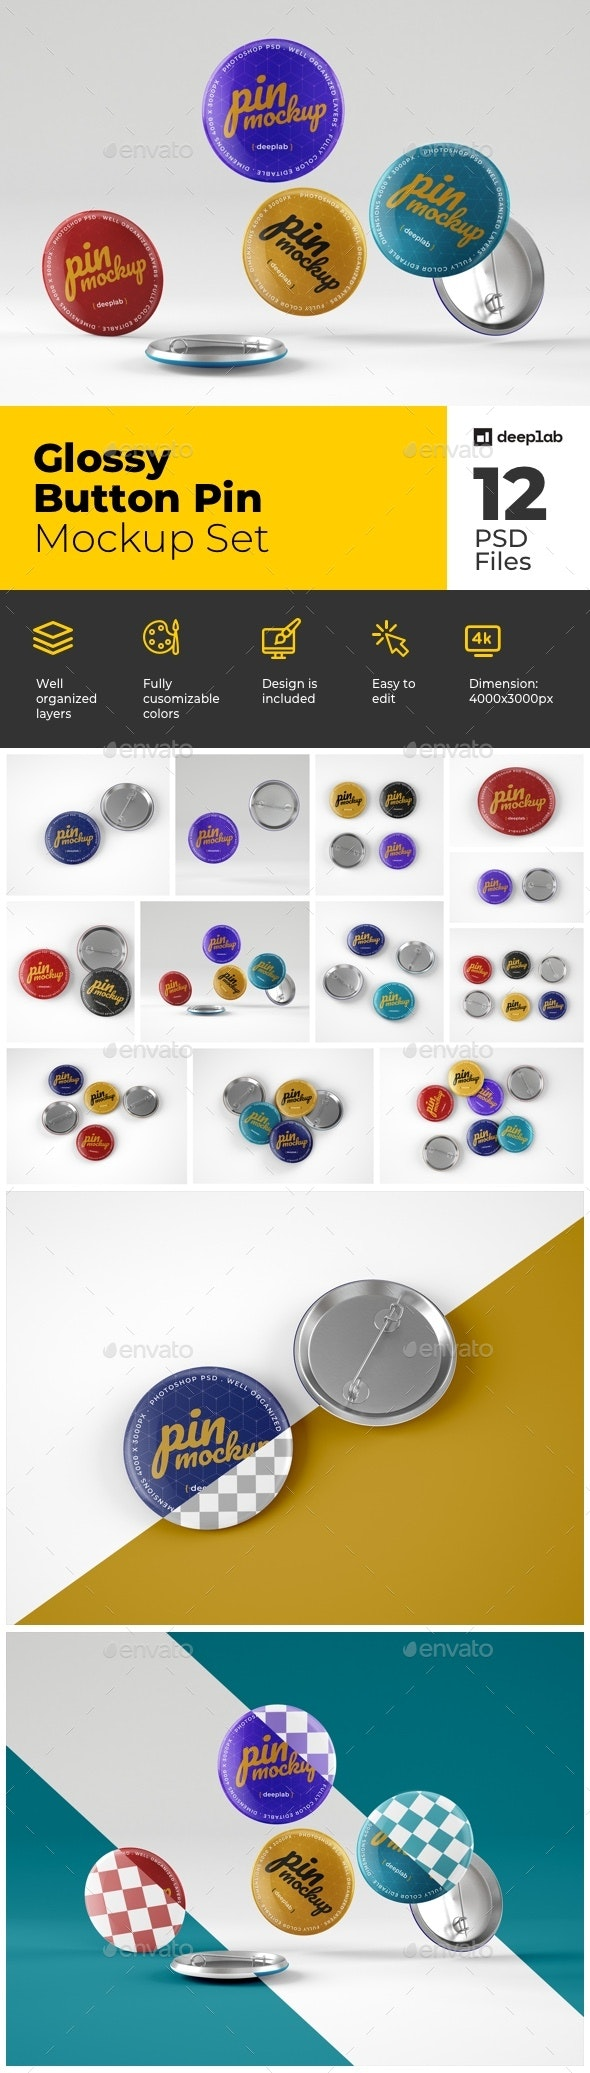 Glossy Button Pin Mockup Set - Product Mock-Ups Graphics